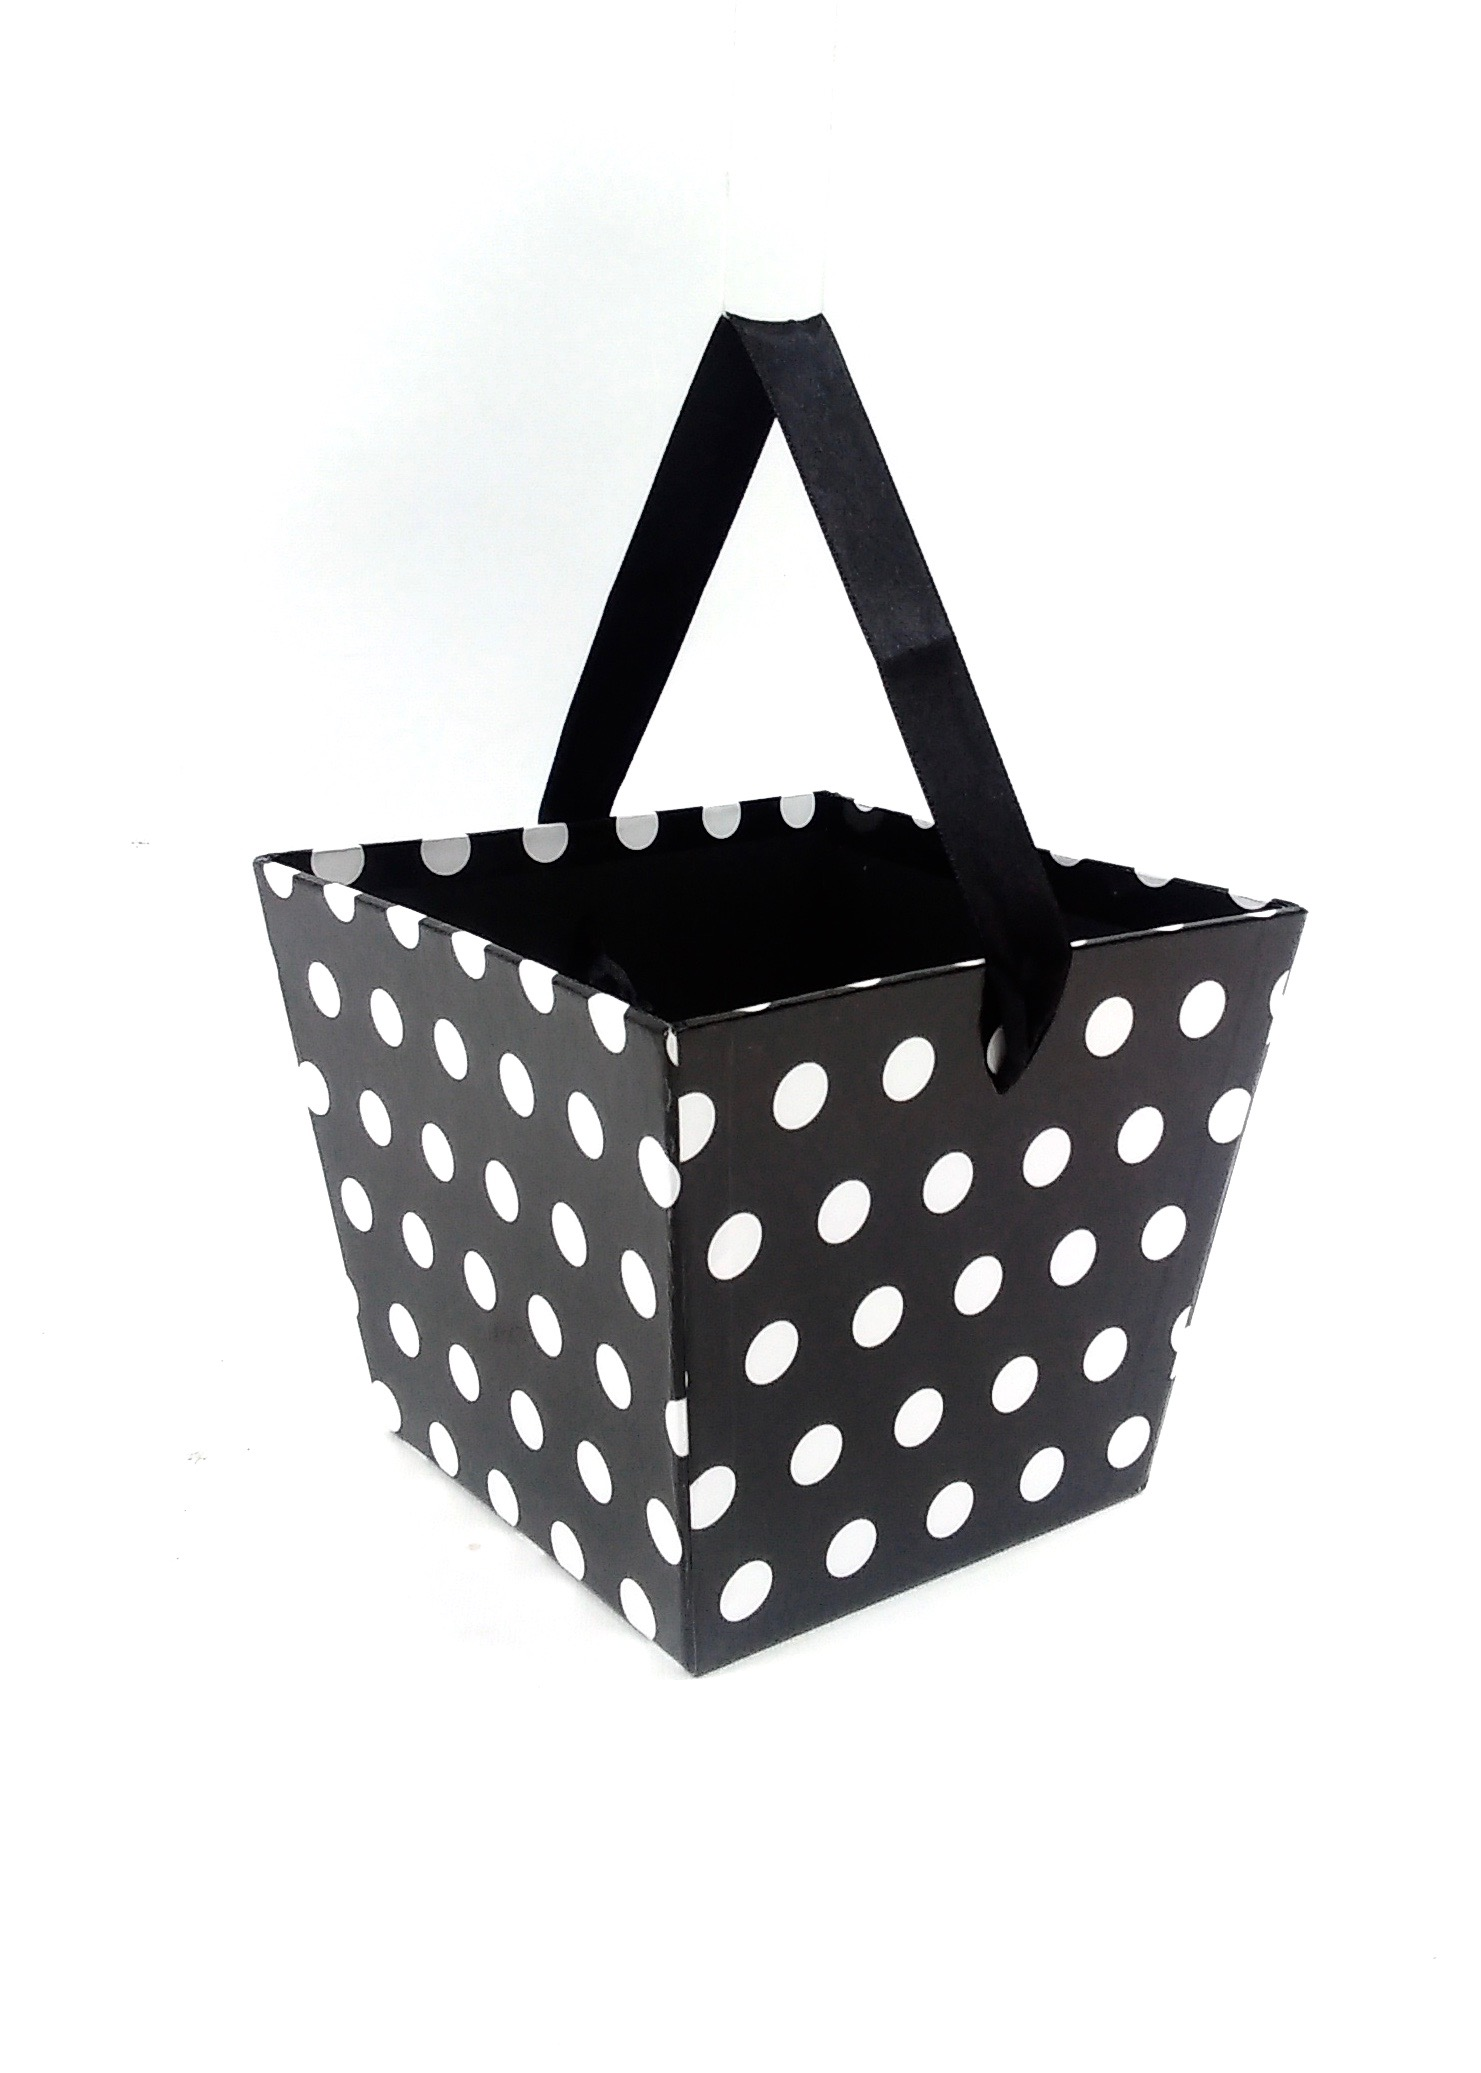 Canadian Wholesale Home Decor Gift Basket Black White Dot Itg10955 0 83 Toys